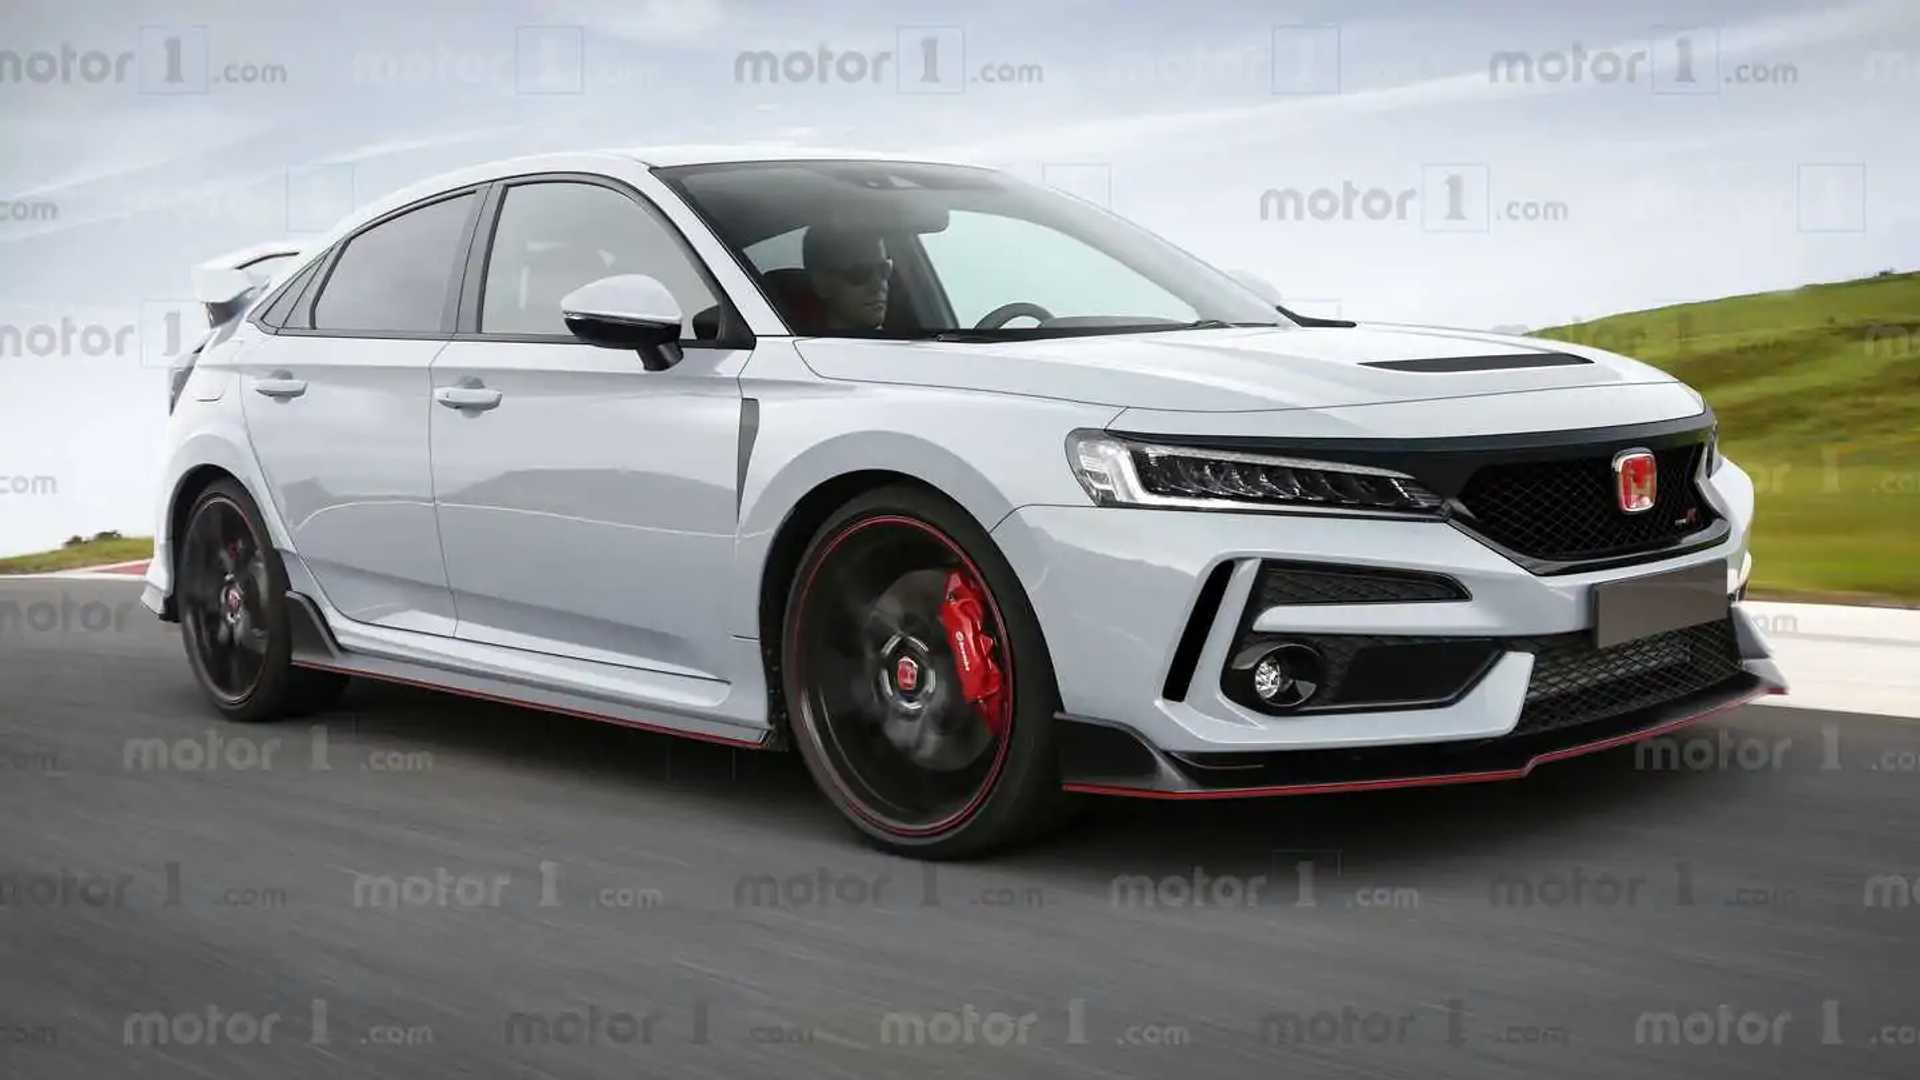 2021 Honda Civic Hybrid Spy Shoot